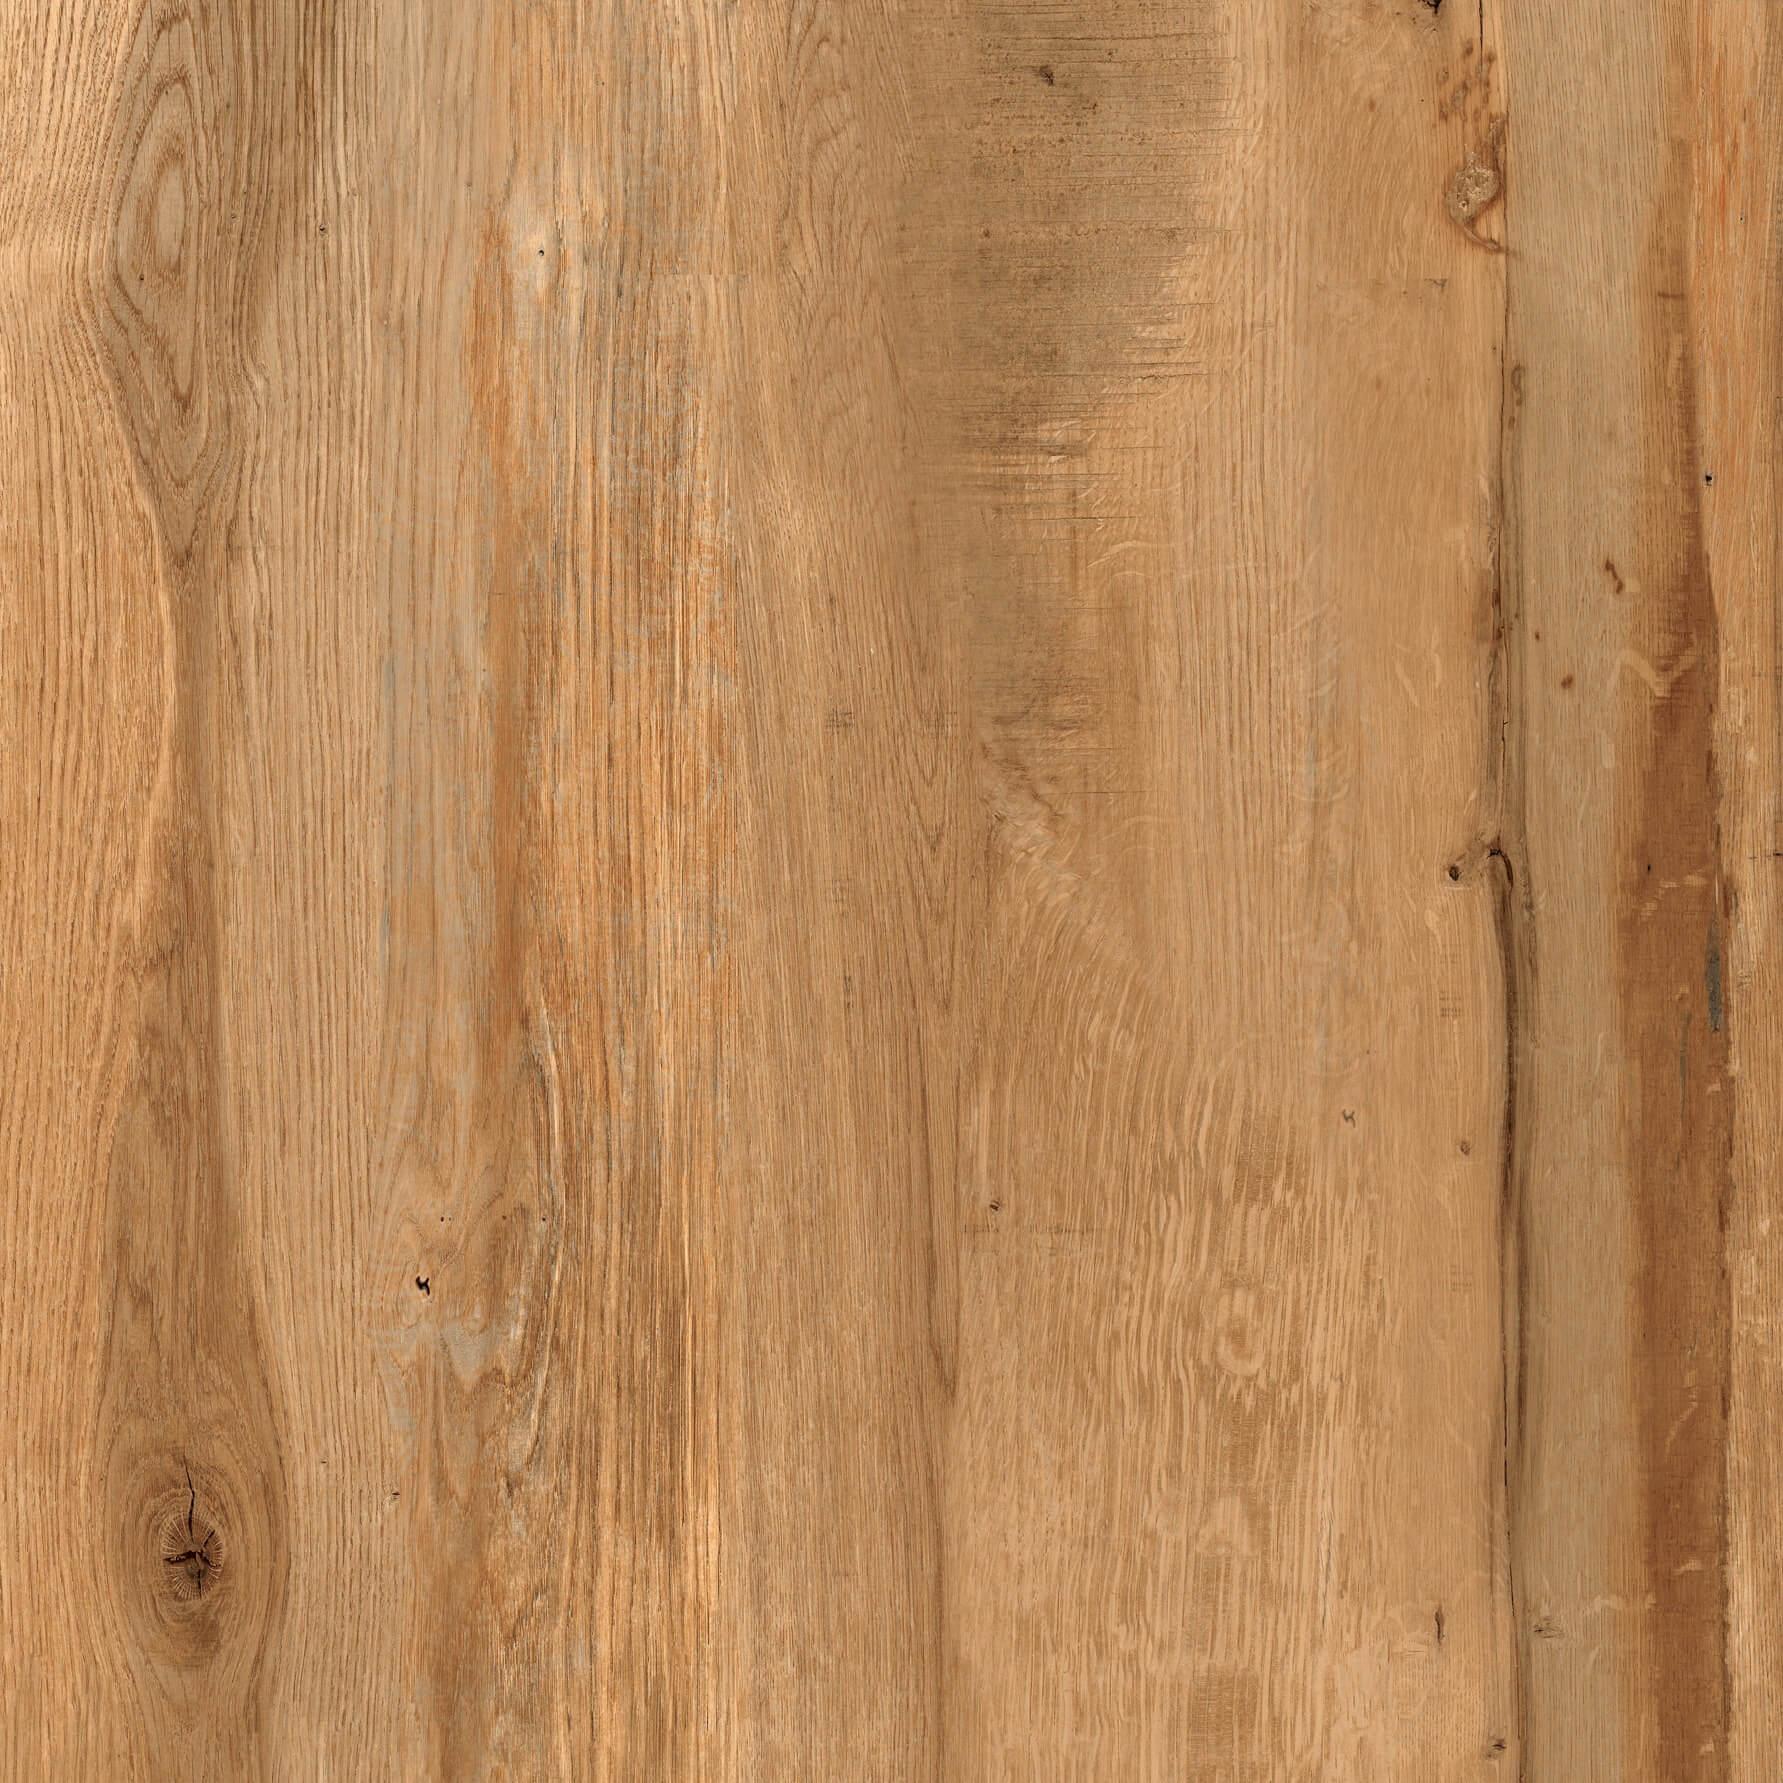 DGVT Rio Wood